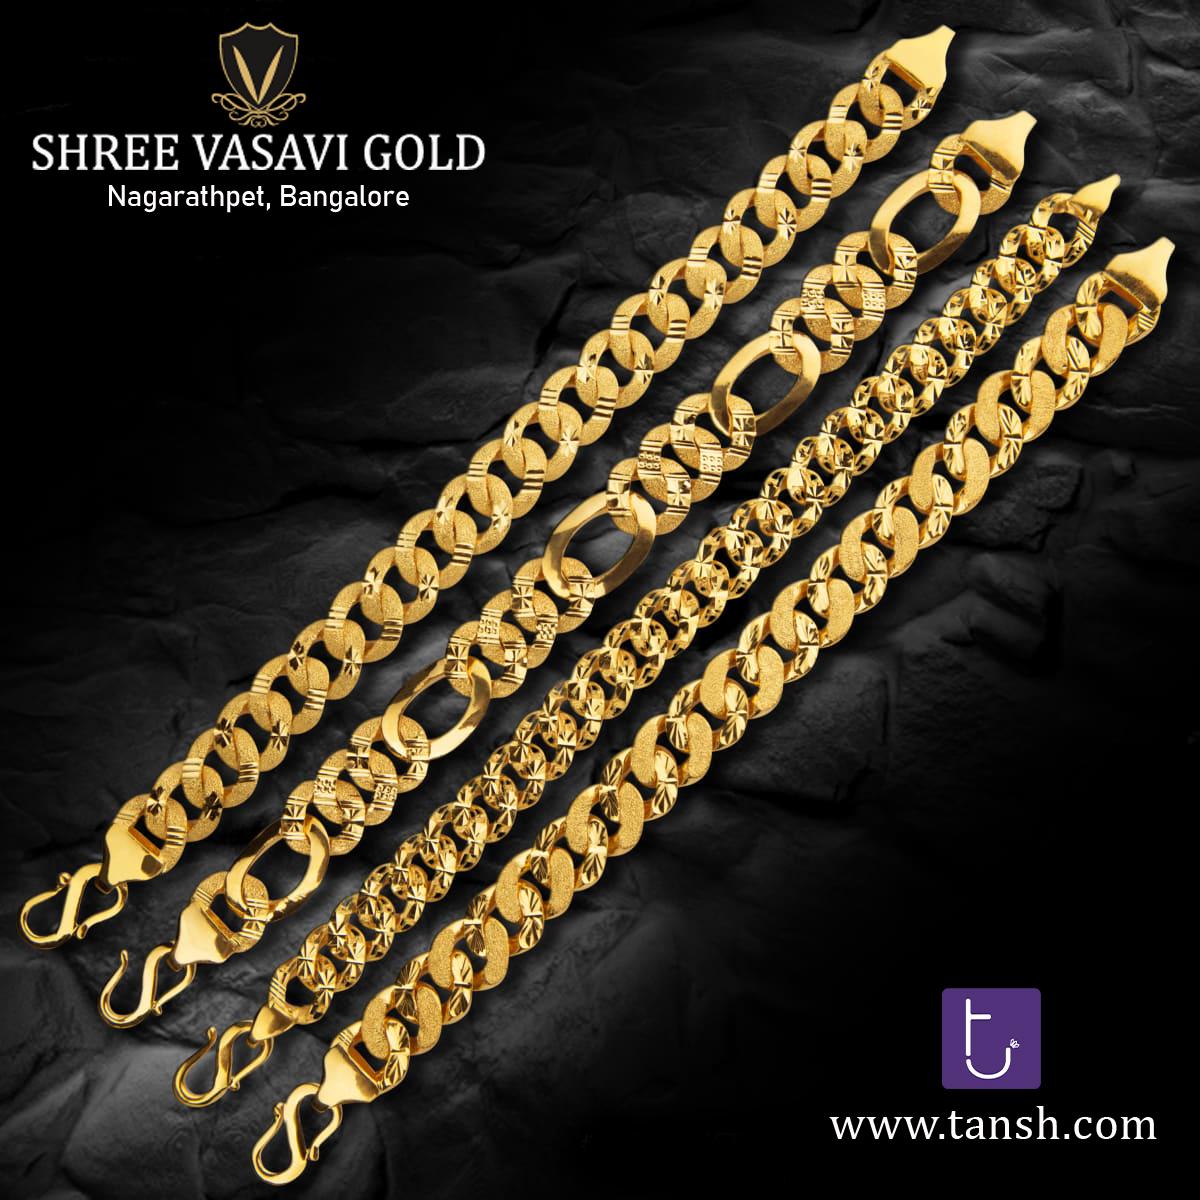 Don't miss the uniqueness of gold and experience it by yourself... #braceletsoftheday #instabracelet #braceletswag #fashionista #necklace #accessories #bracelet #braceletstacks #earringstagram #earringlove #earringswag #trendy #bracelets #instabraceletshttps://www.tansh.com/jewellery/gold/bracelets.html…pic.twitter.com/w1OQFM3u1j